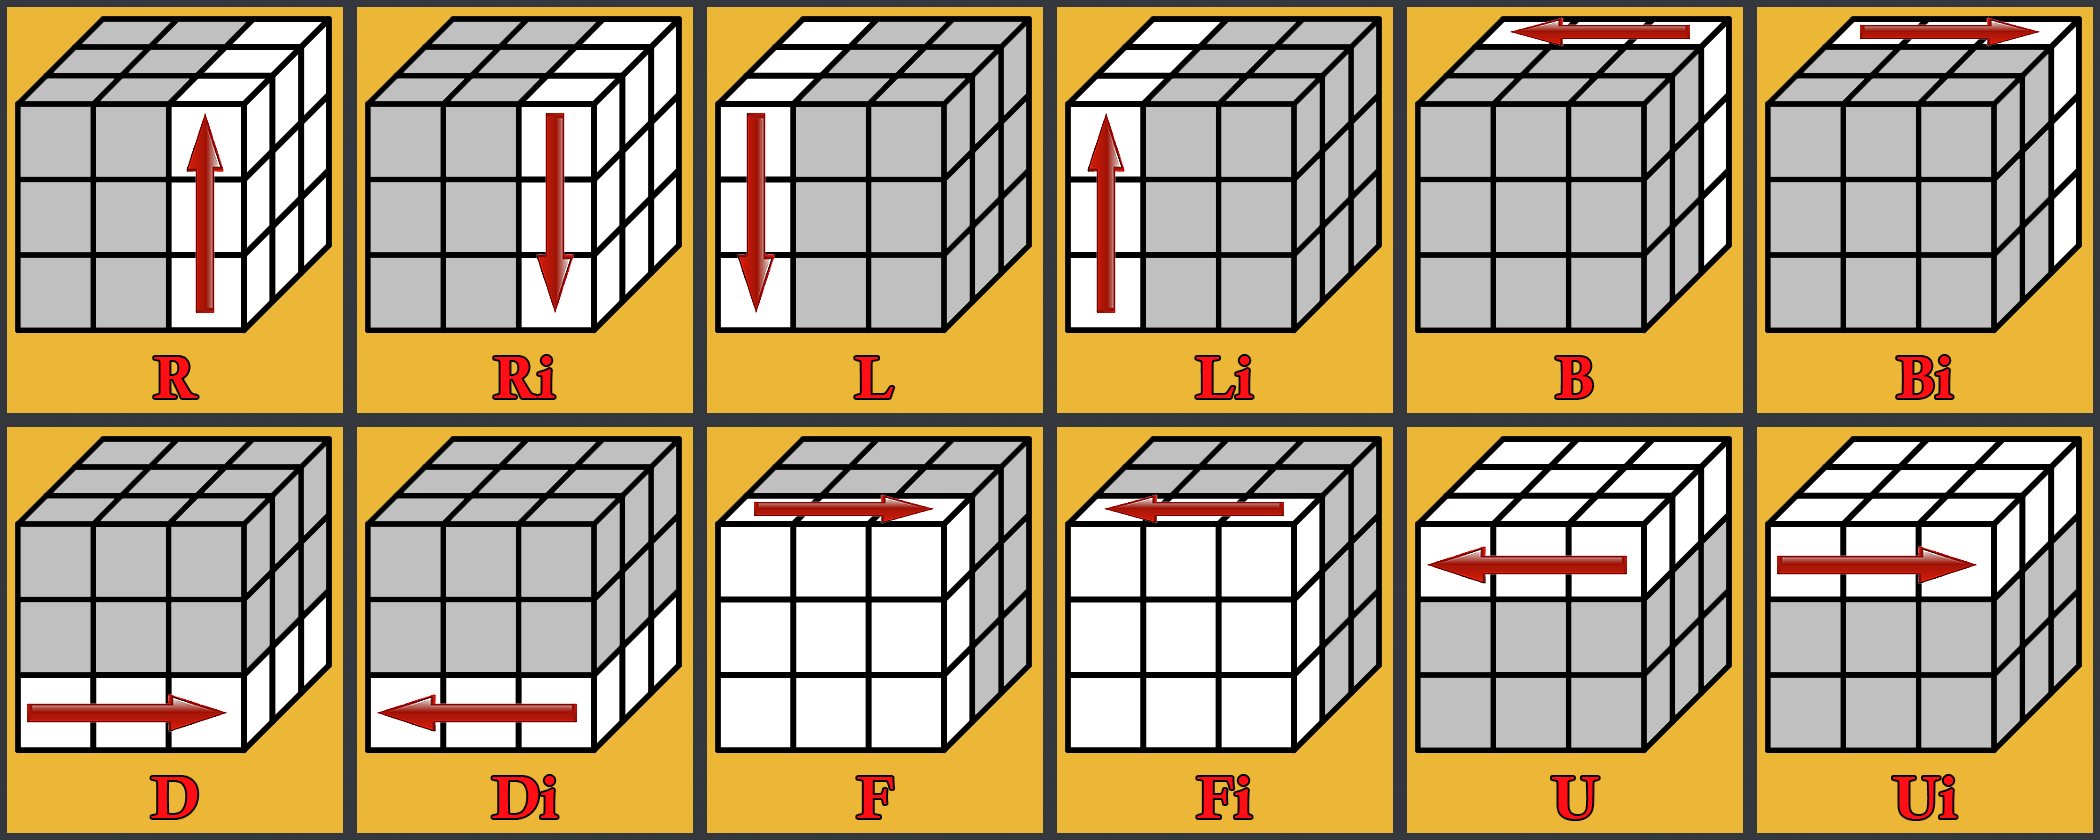 Движения на куба